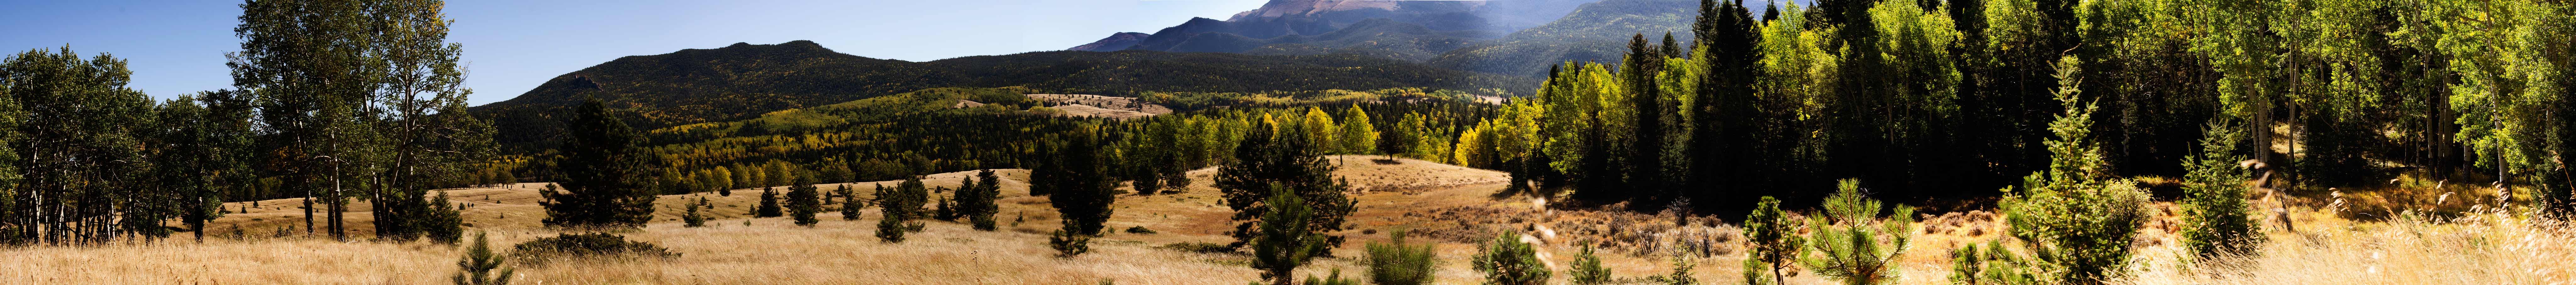 jenphotographs mueller colorado panorama landscape